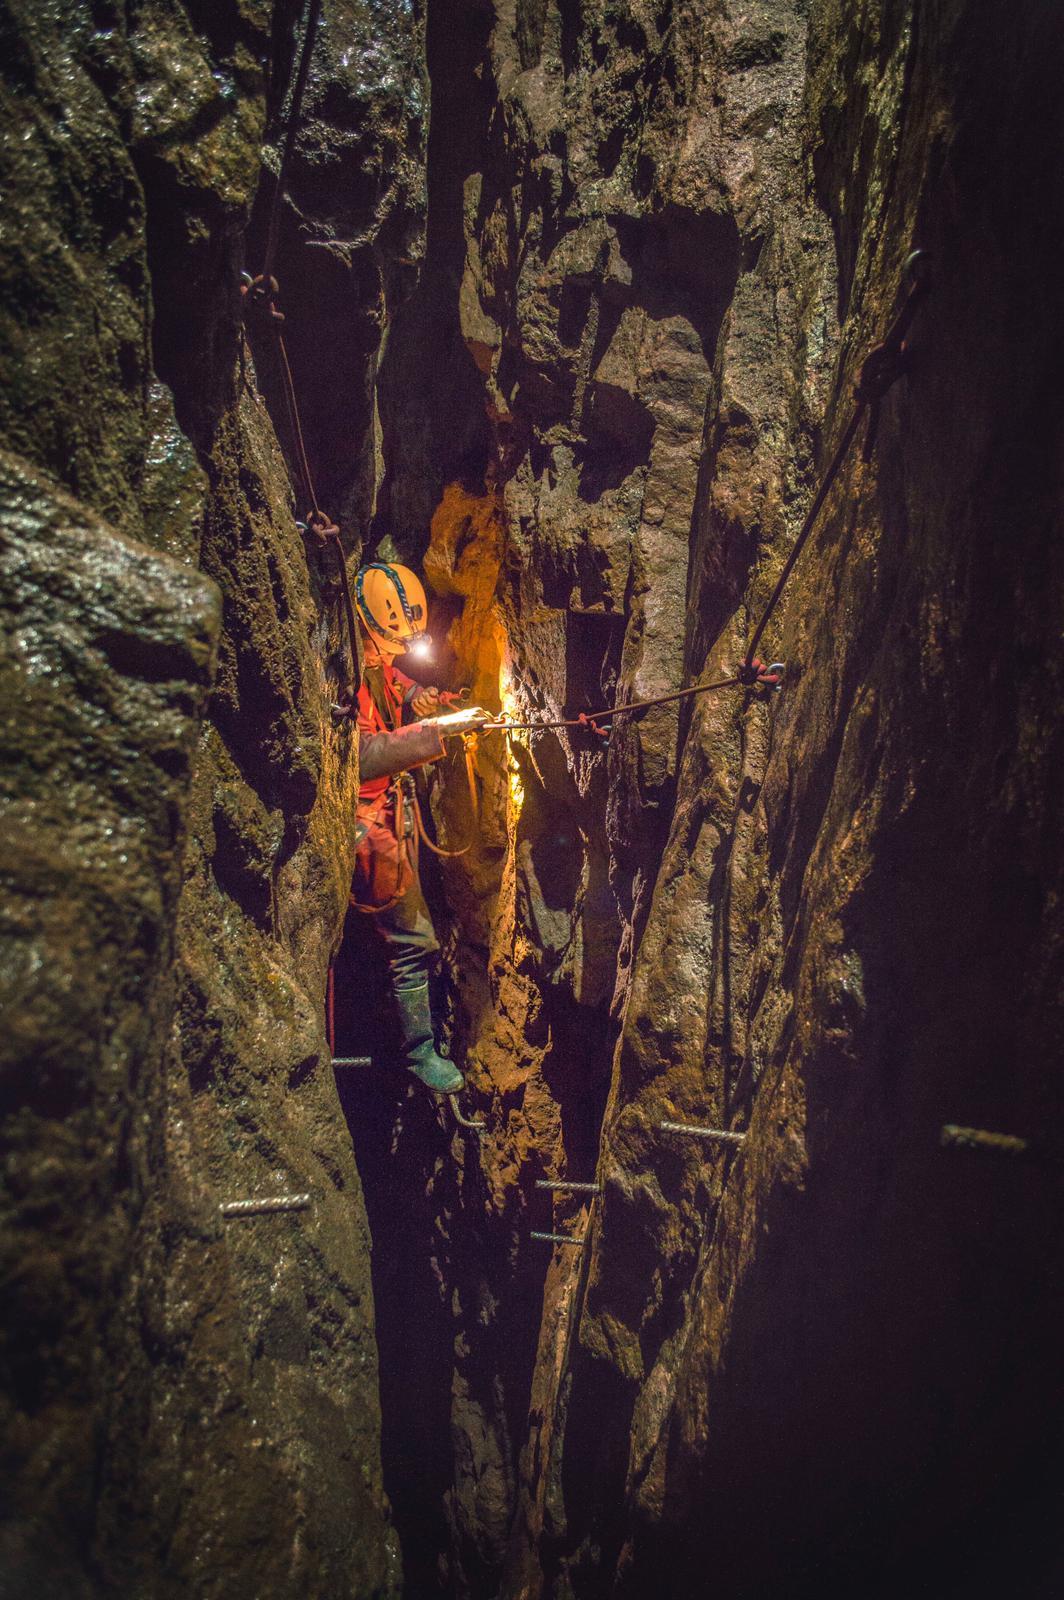 Mine explorer having fun in a tin mine in Truro, Cornwall